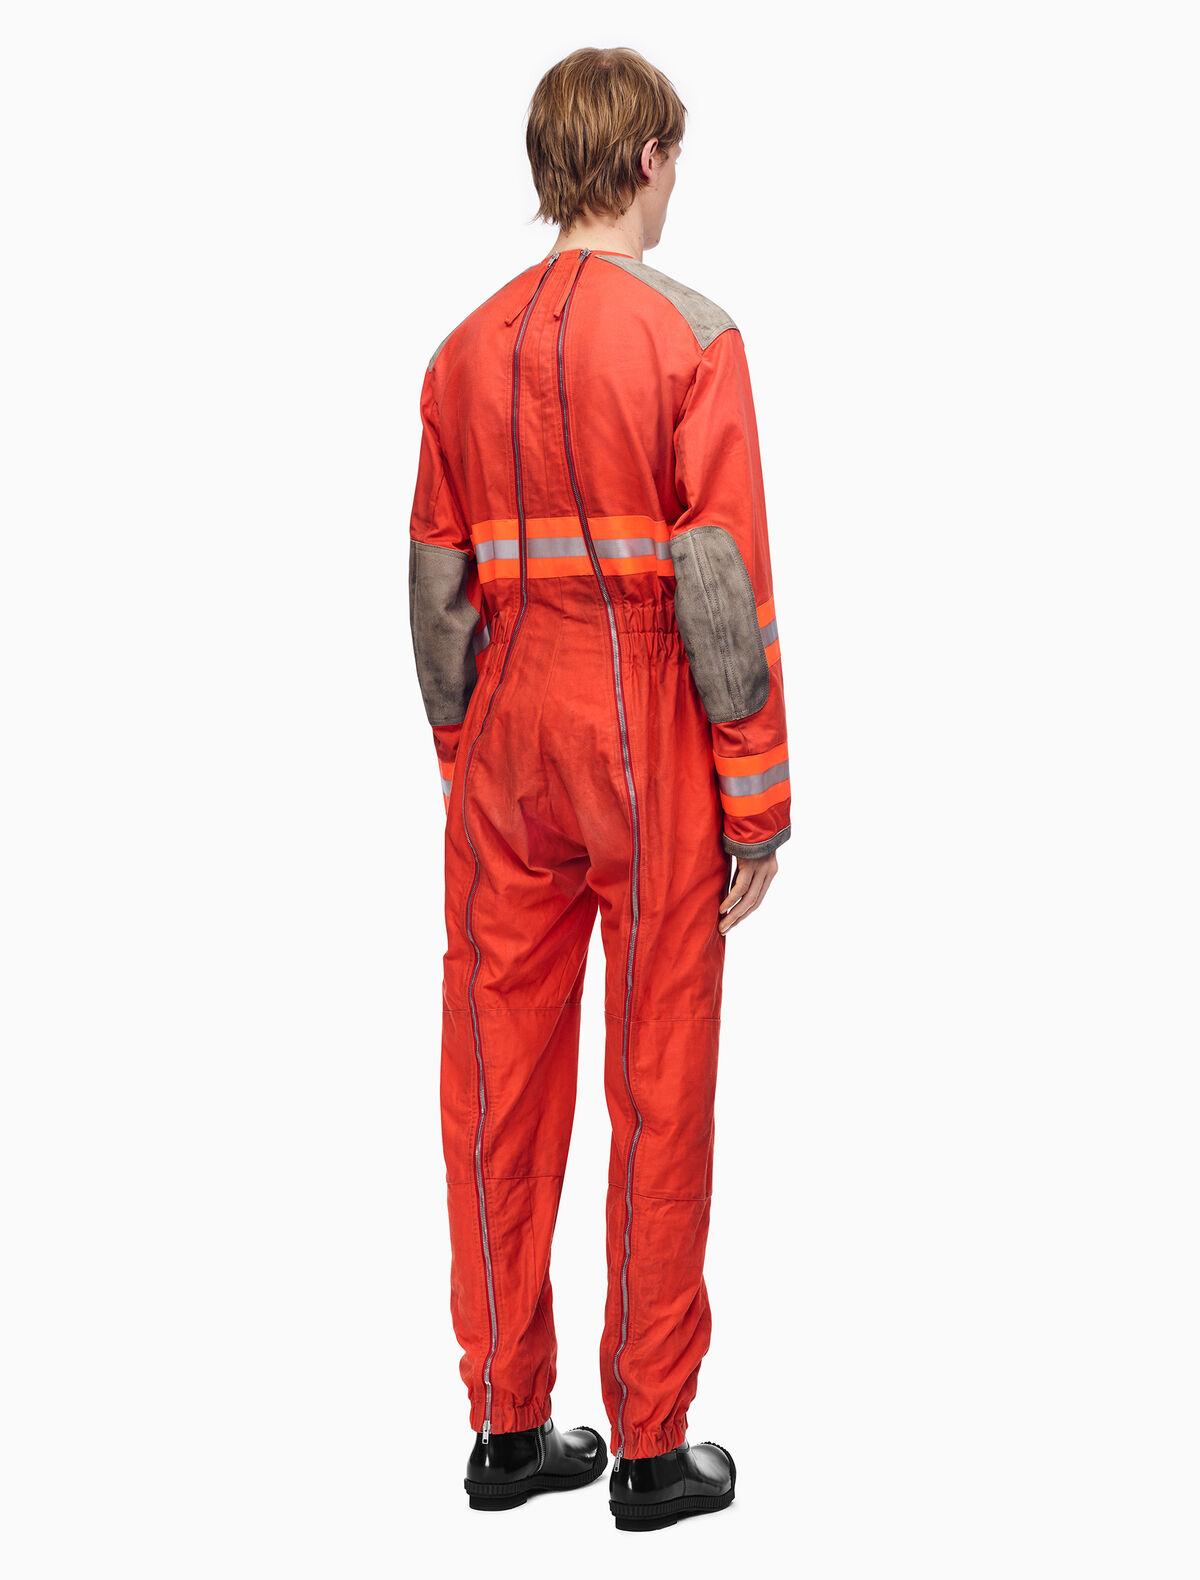 28d53b0bcd69 BUY DISTRESSED FIREMAN JUMPSUIT - Calvin Klein South Korea